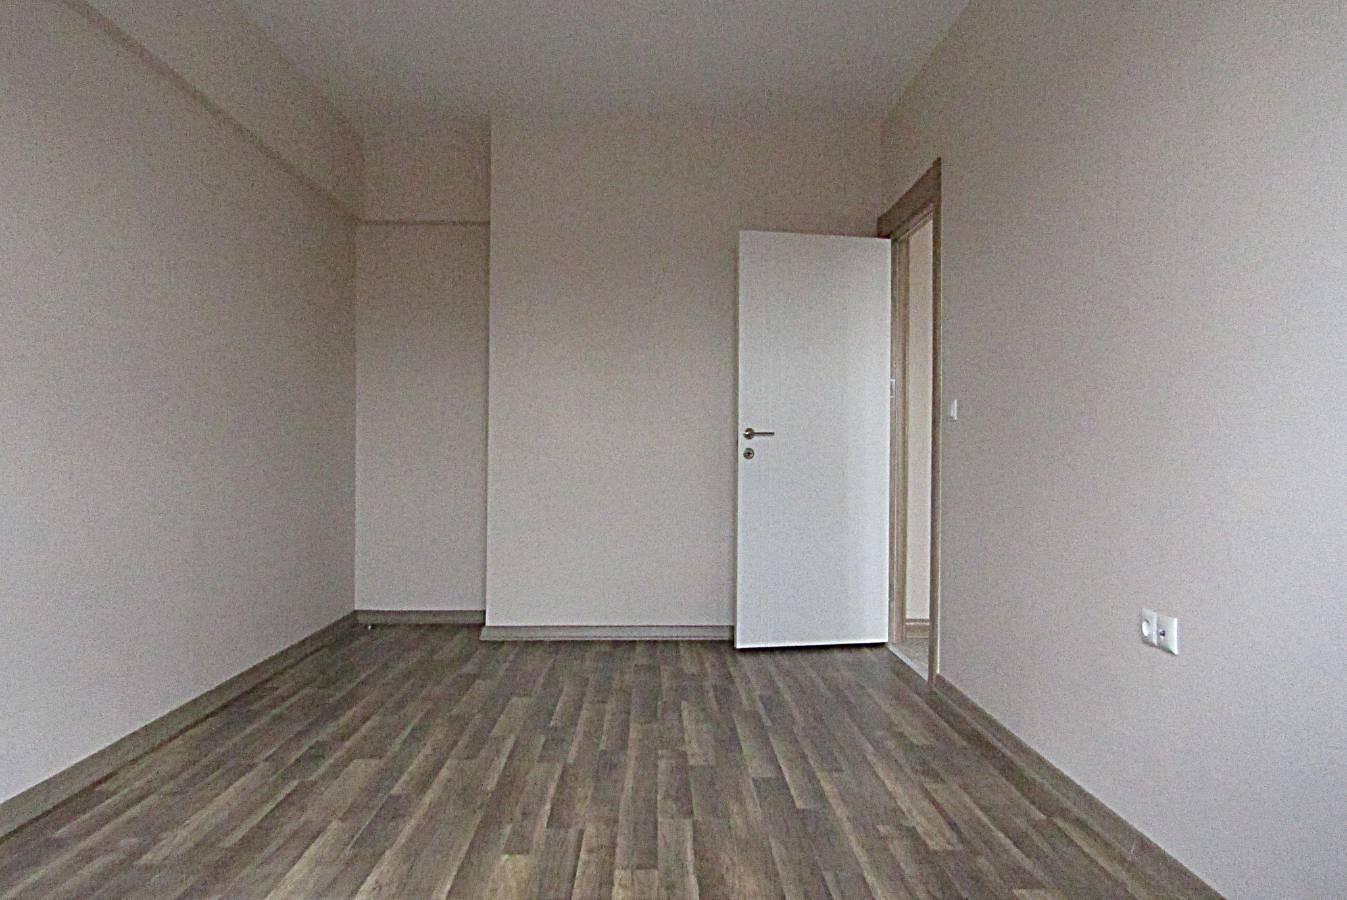 SR EMLAK'TAN ALSANCAK MAH'DE 3+1 170 m² FULL YAPILI ASANSÖRLÜ SIFIR DUBLEX  TERAS DAİRE